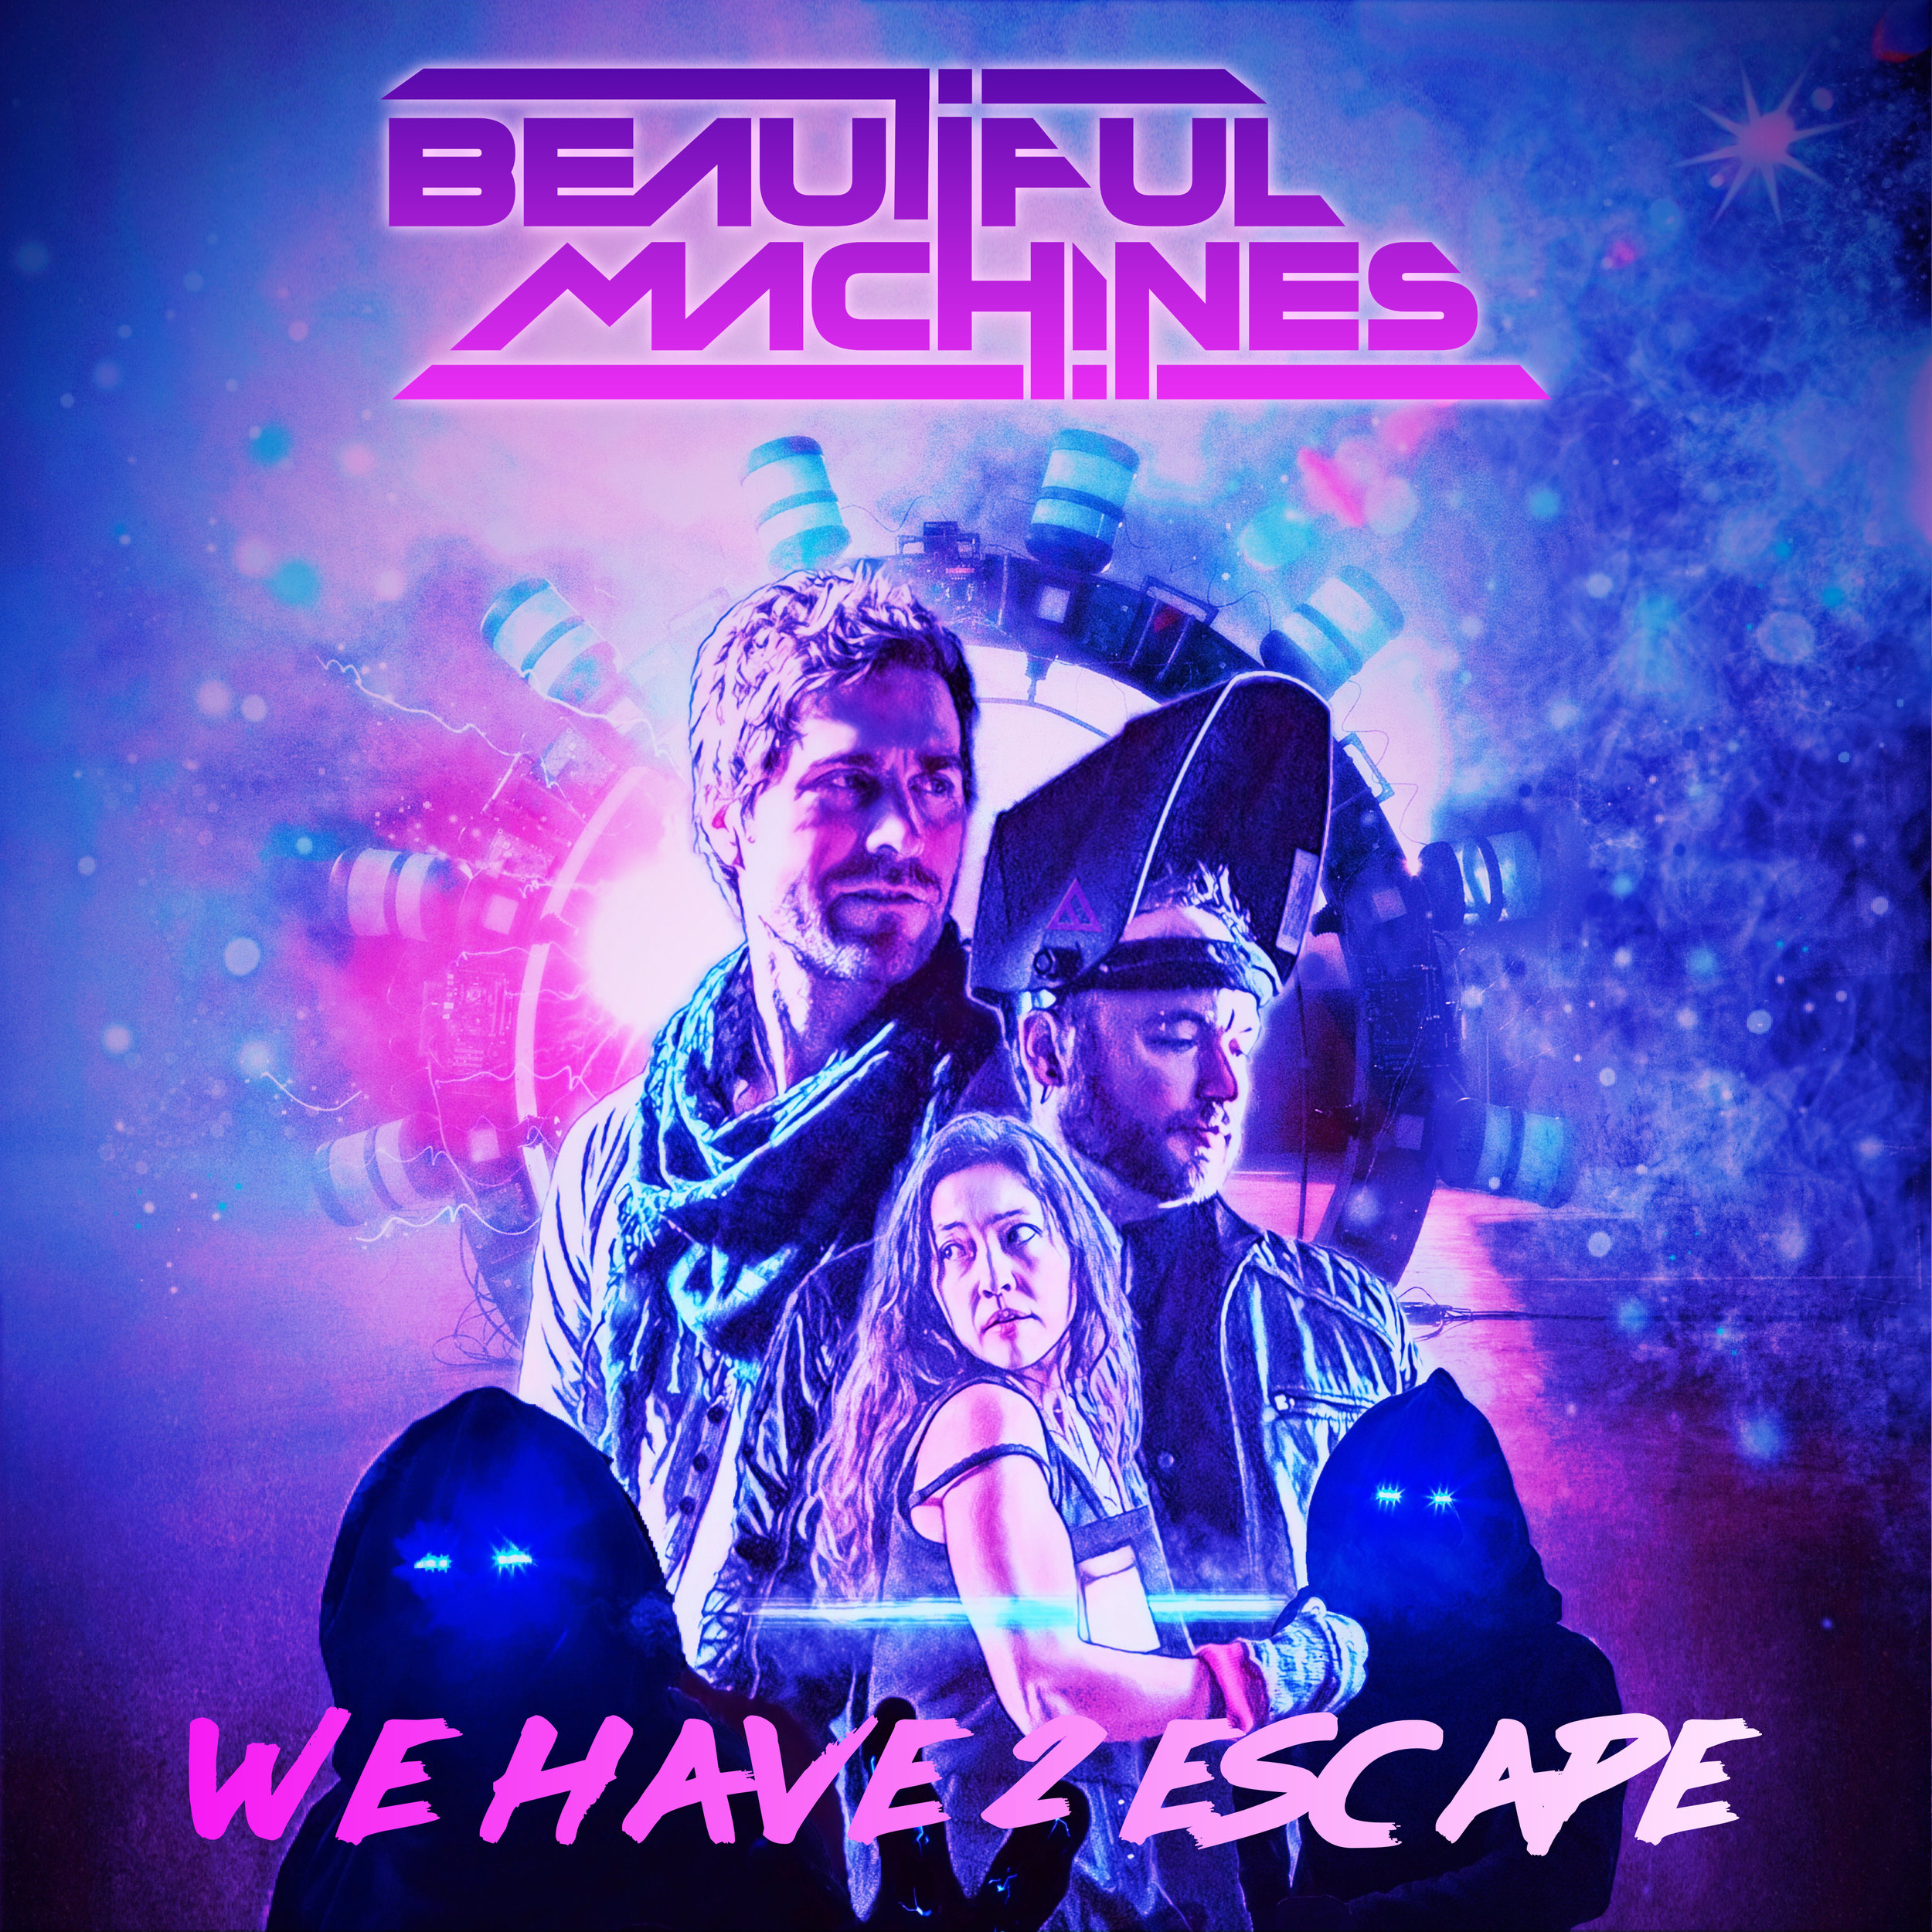 Beautiful Machines - We Have 2 Escape Art.jpg